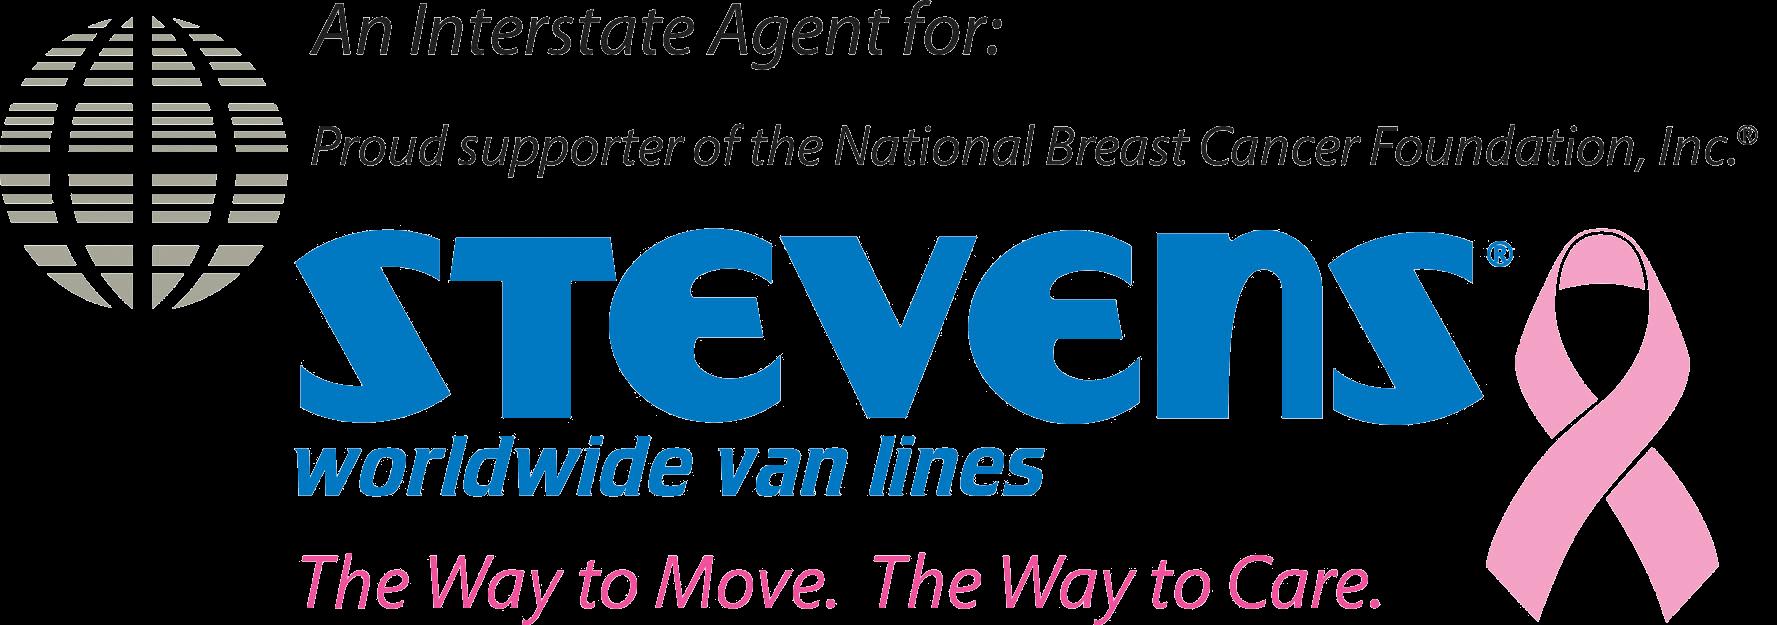 Stevens Worldwide Van Lines Logo